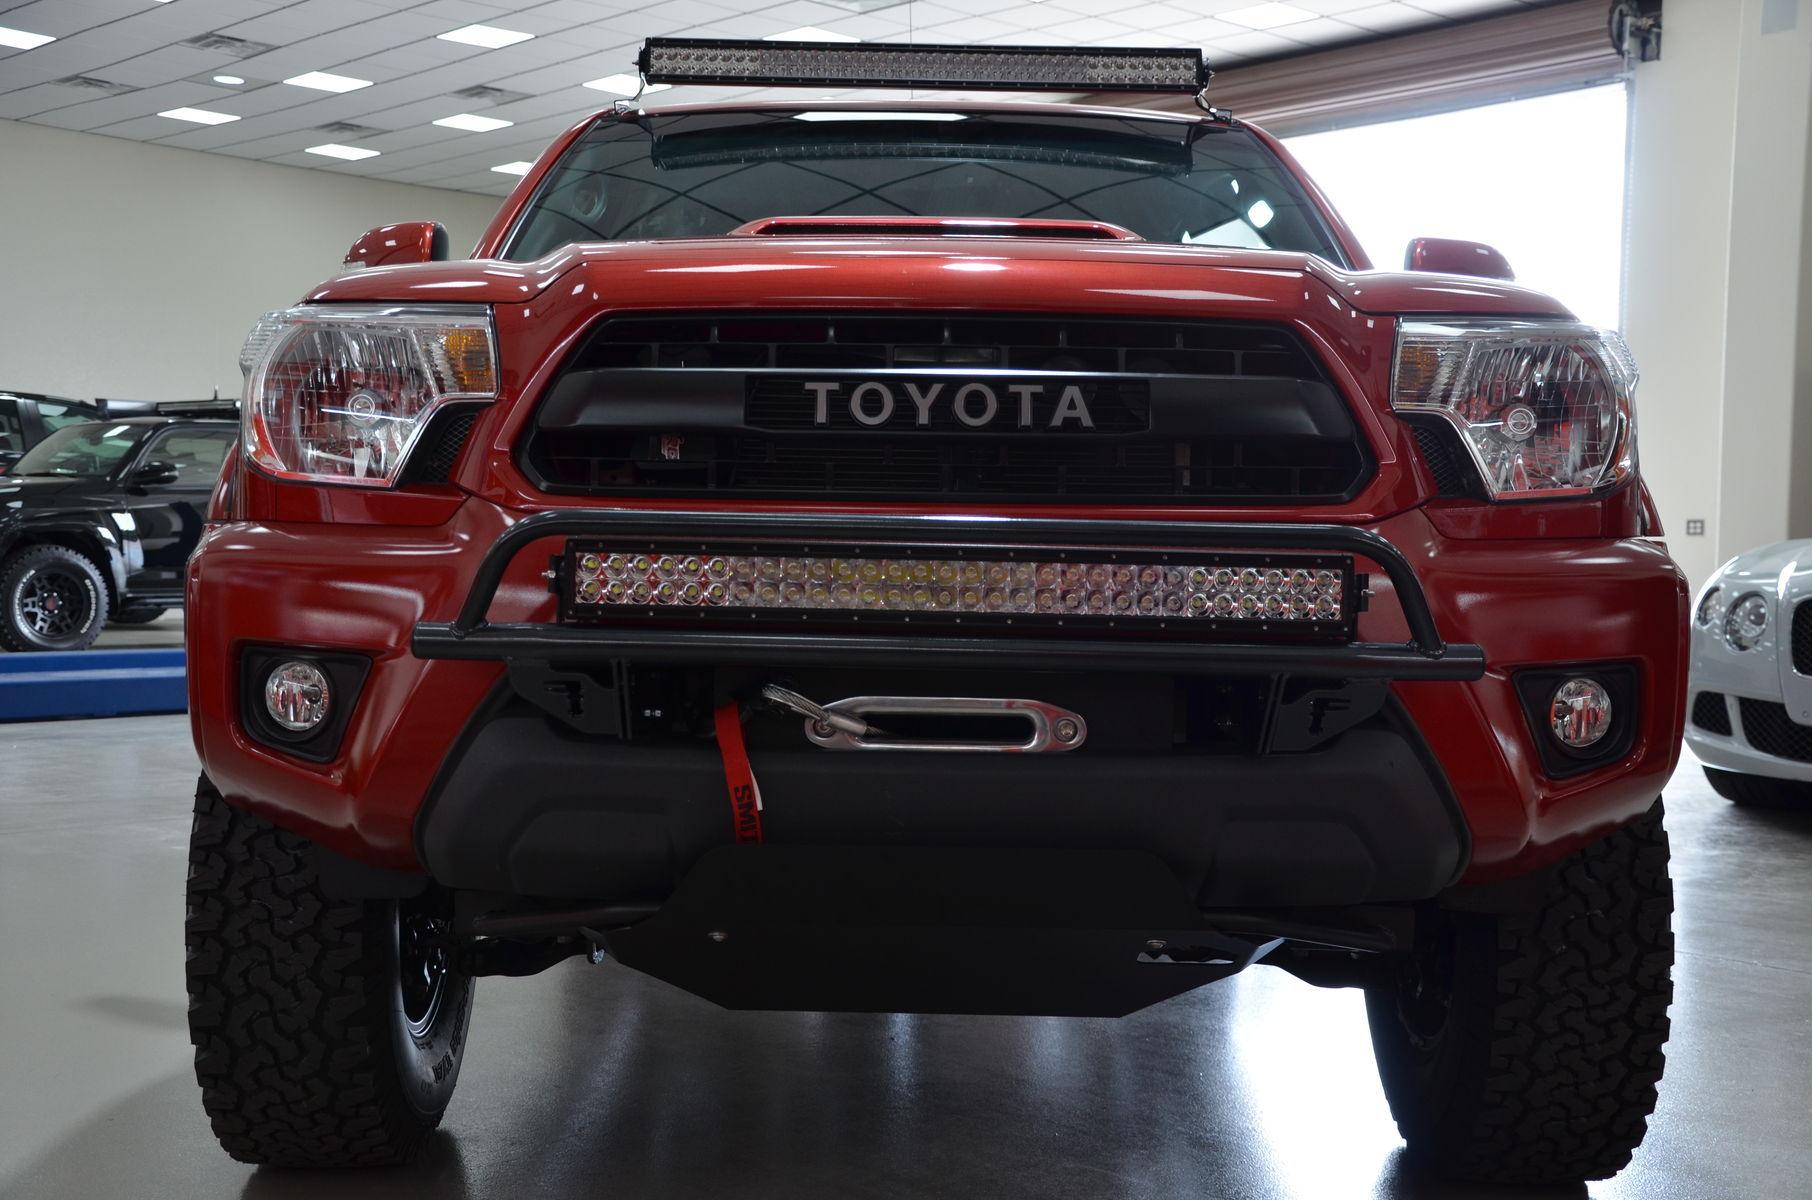 2014 Toyota Tacoma | N-FAB TRD PRO Build - Toyota Tacoma Front Profile Shot